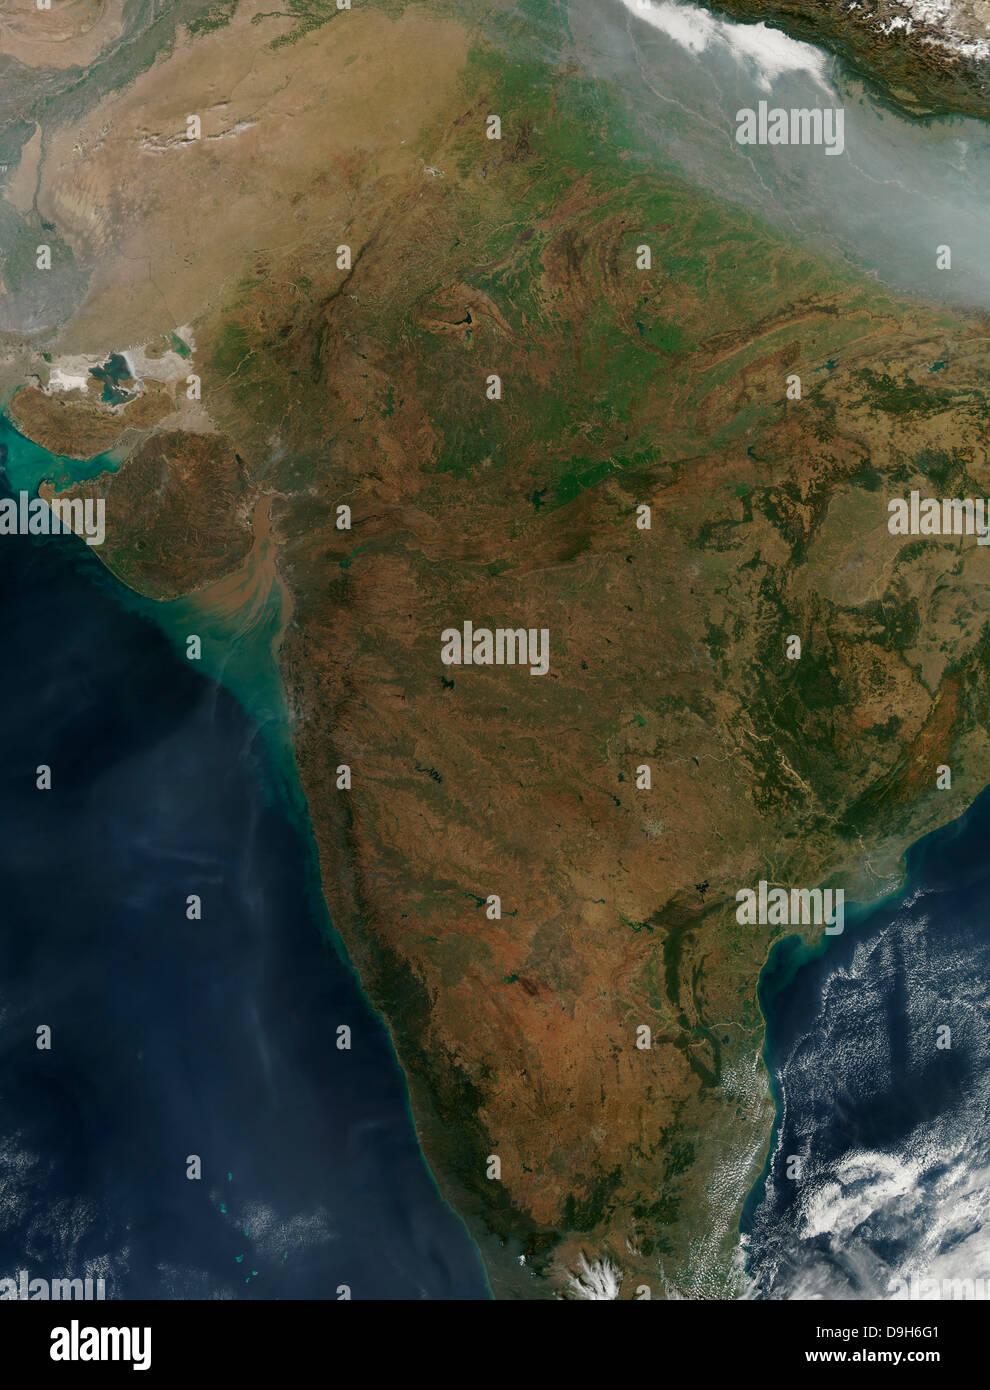 Deccan Plateau India Stock Photos & Deccan Plateau India ... on manchurian plain map, brahmaputra river map, bhander plateau, great indian desert map, tibetan plateau, india map, tibet map, himalayan mountains map, narmada river map, mysore plateau, kashmir map, arabian sea map, khyber pass map, thar desert map, patna map, harappa map, chota nagpur plateau, laccadive sea map, hyderabad map, taklamakan desert map, gobi desert map, delhi map, satpura range map, nepal map, shah alam ii, states of india,